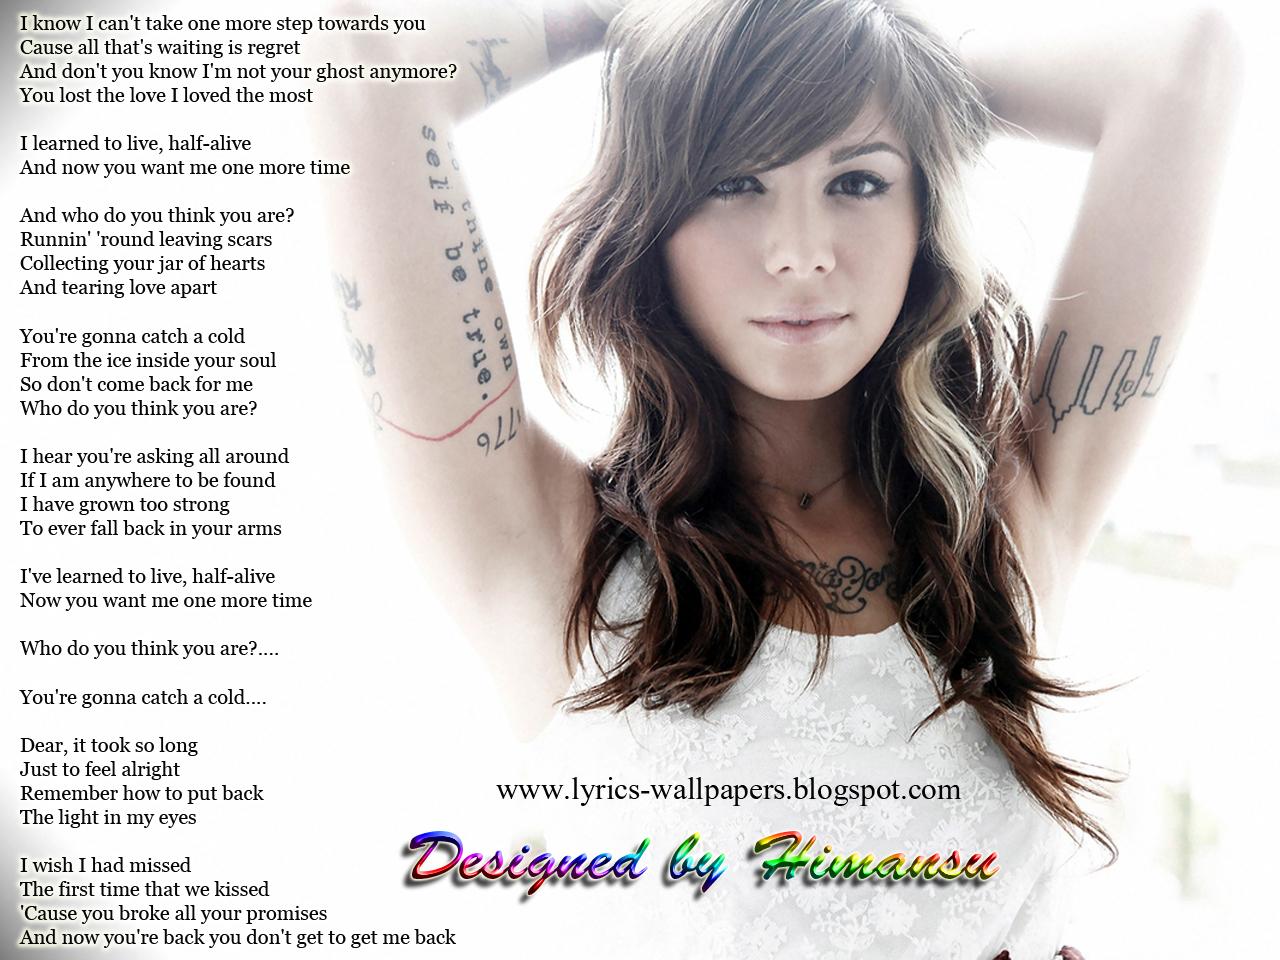 lyrics wallpapers christina perri jar of hearts artist christina perri 1280x960